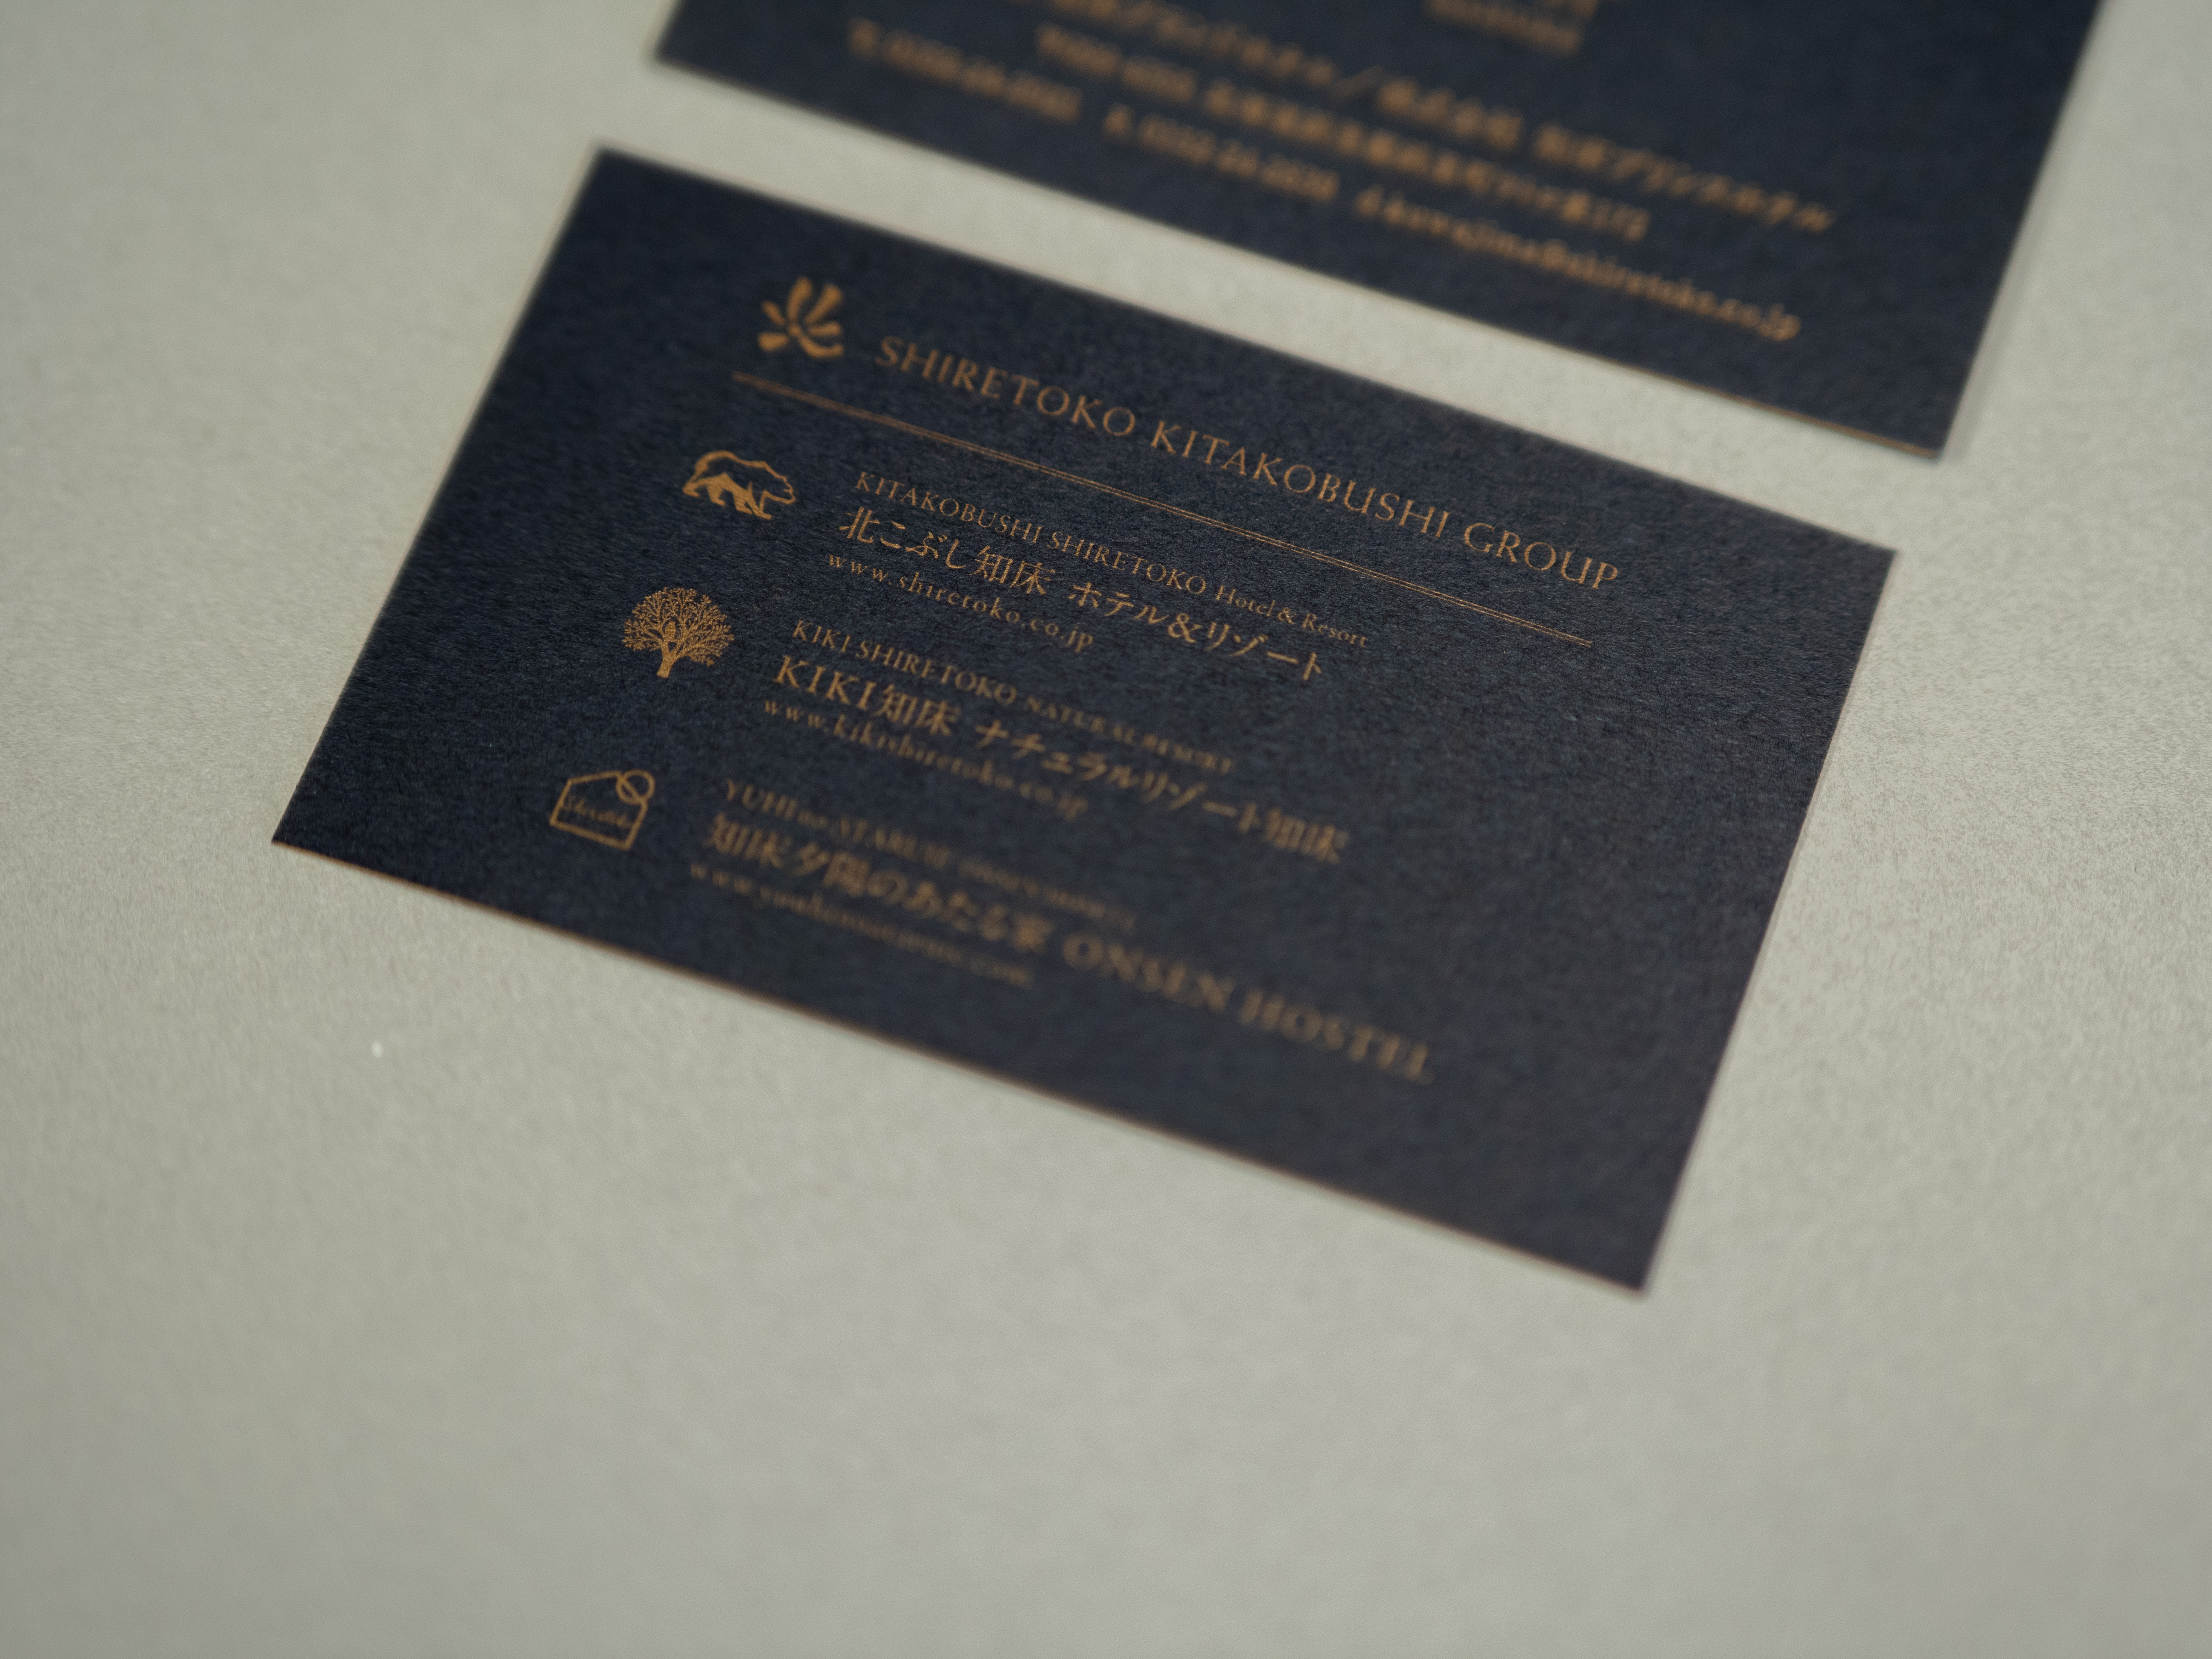 <span>Press printing</span><br>知床北こぶしグループ<br>名刺